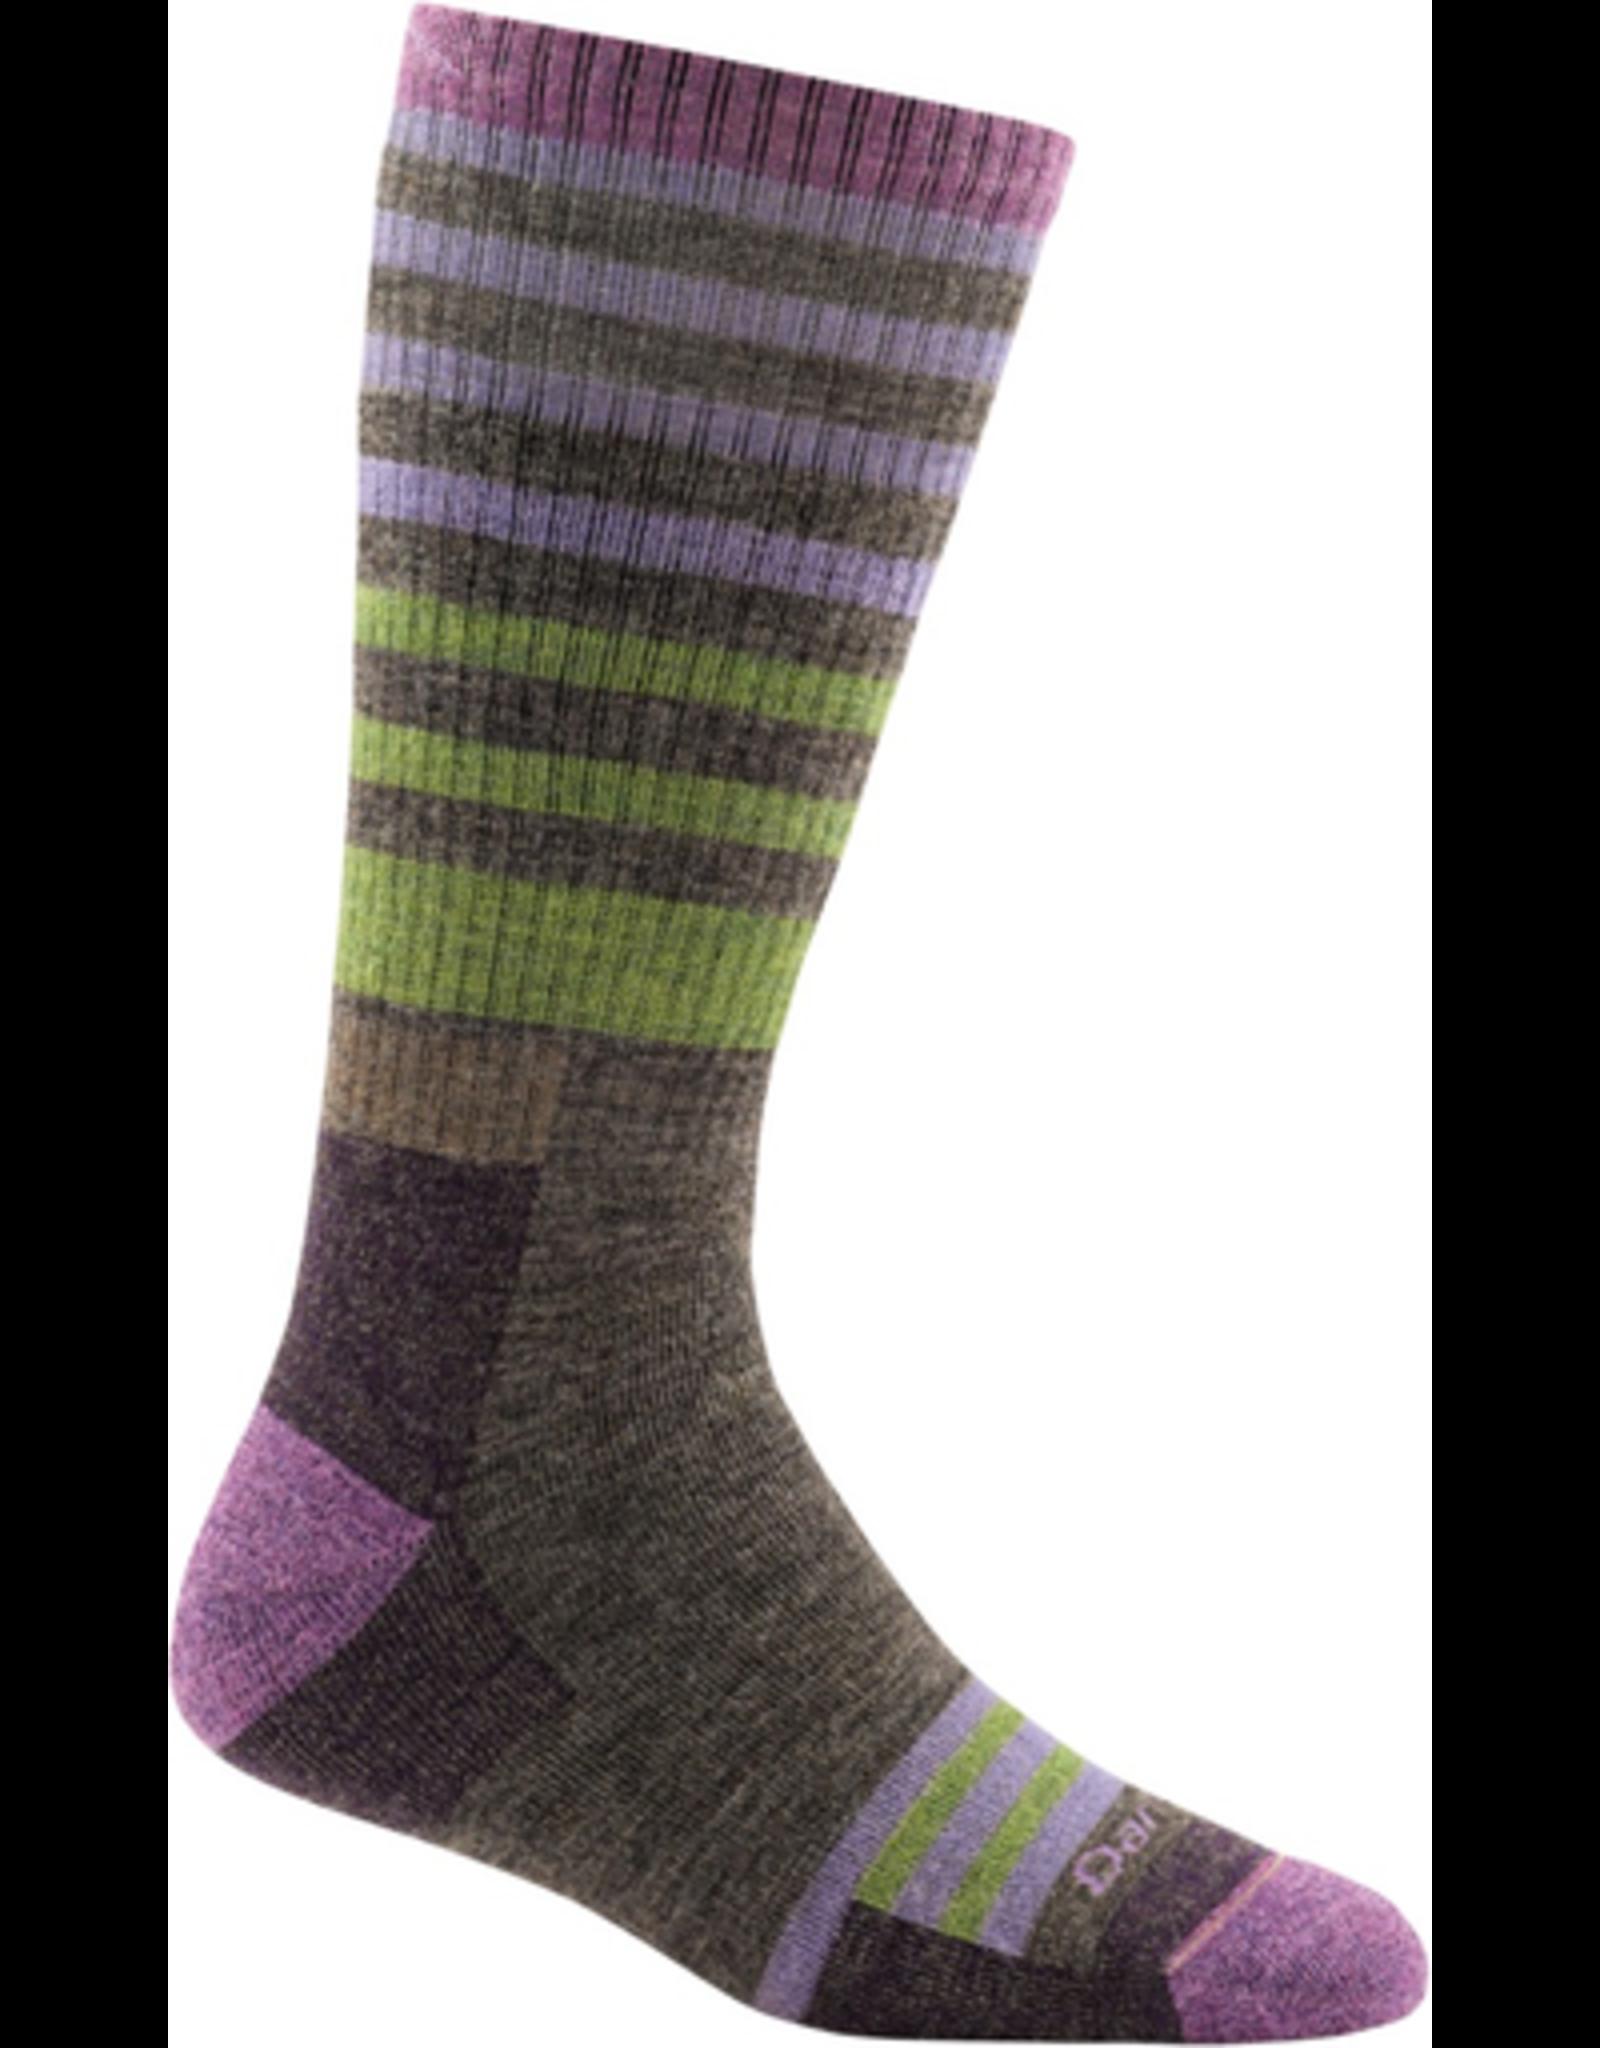 Darn Tough Darn Tough Women's Gatewood BOOT FULL CUSHION Sock